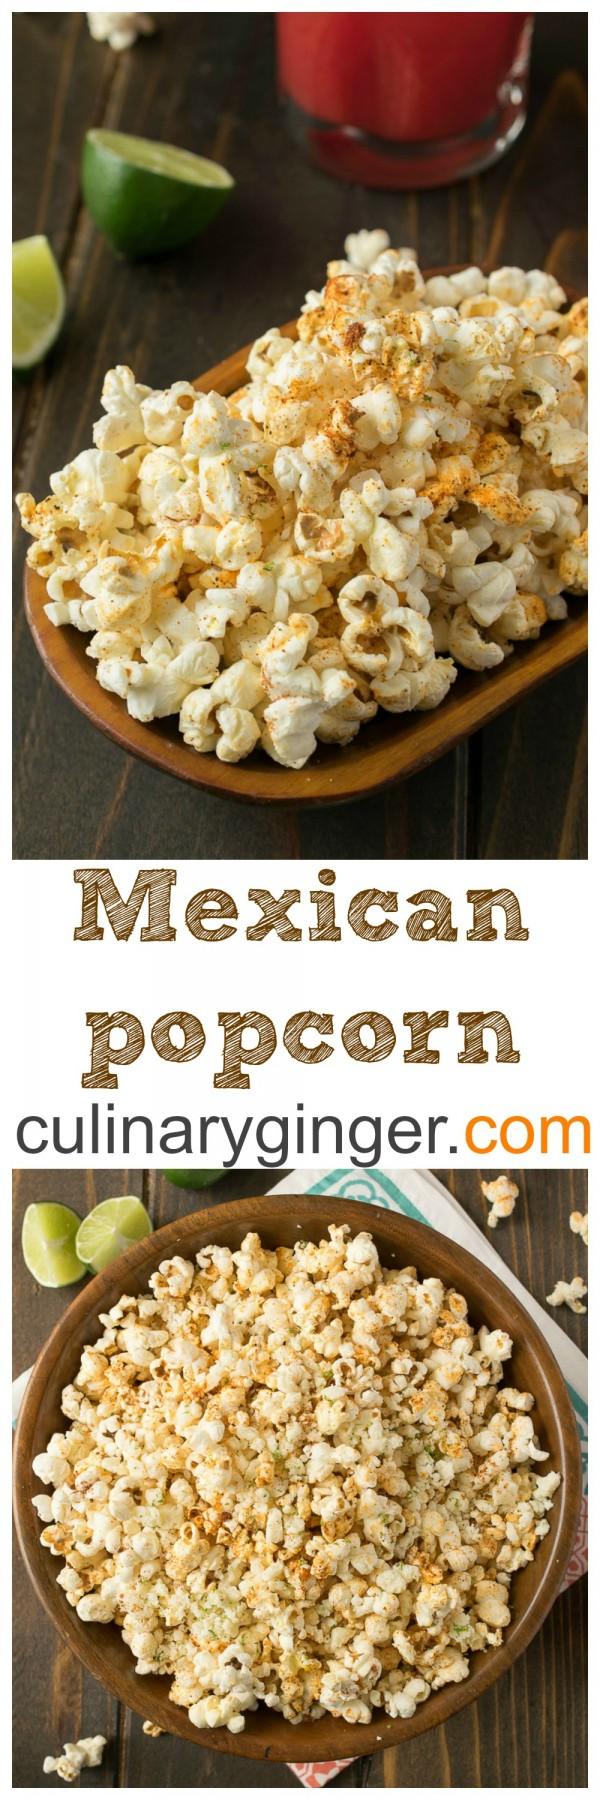 Mexican popcorn